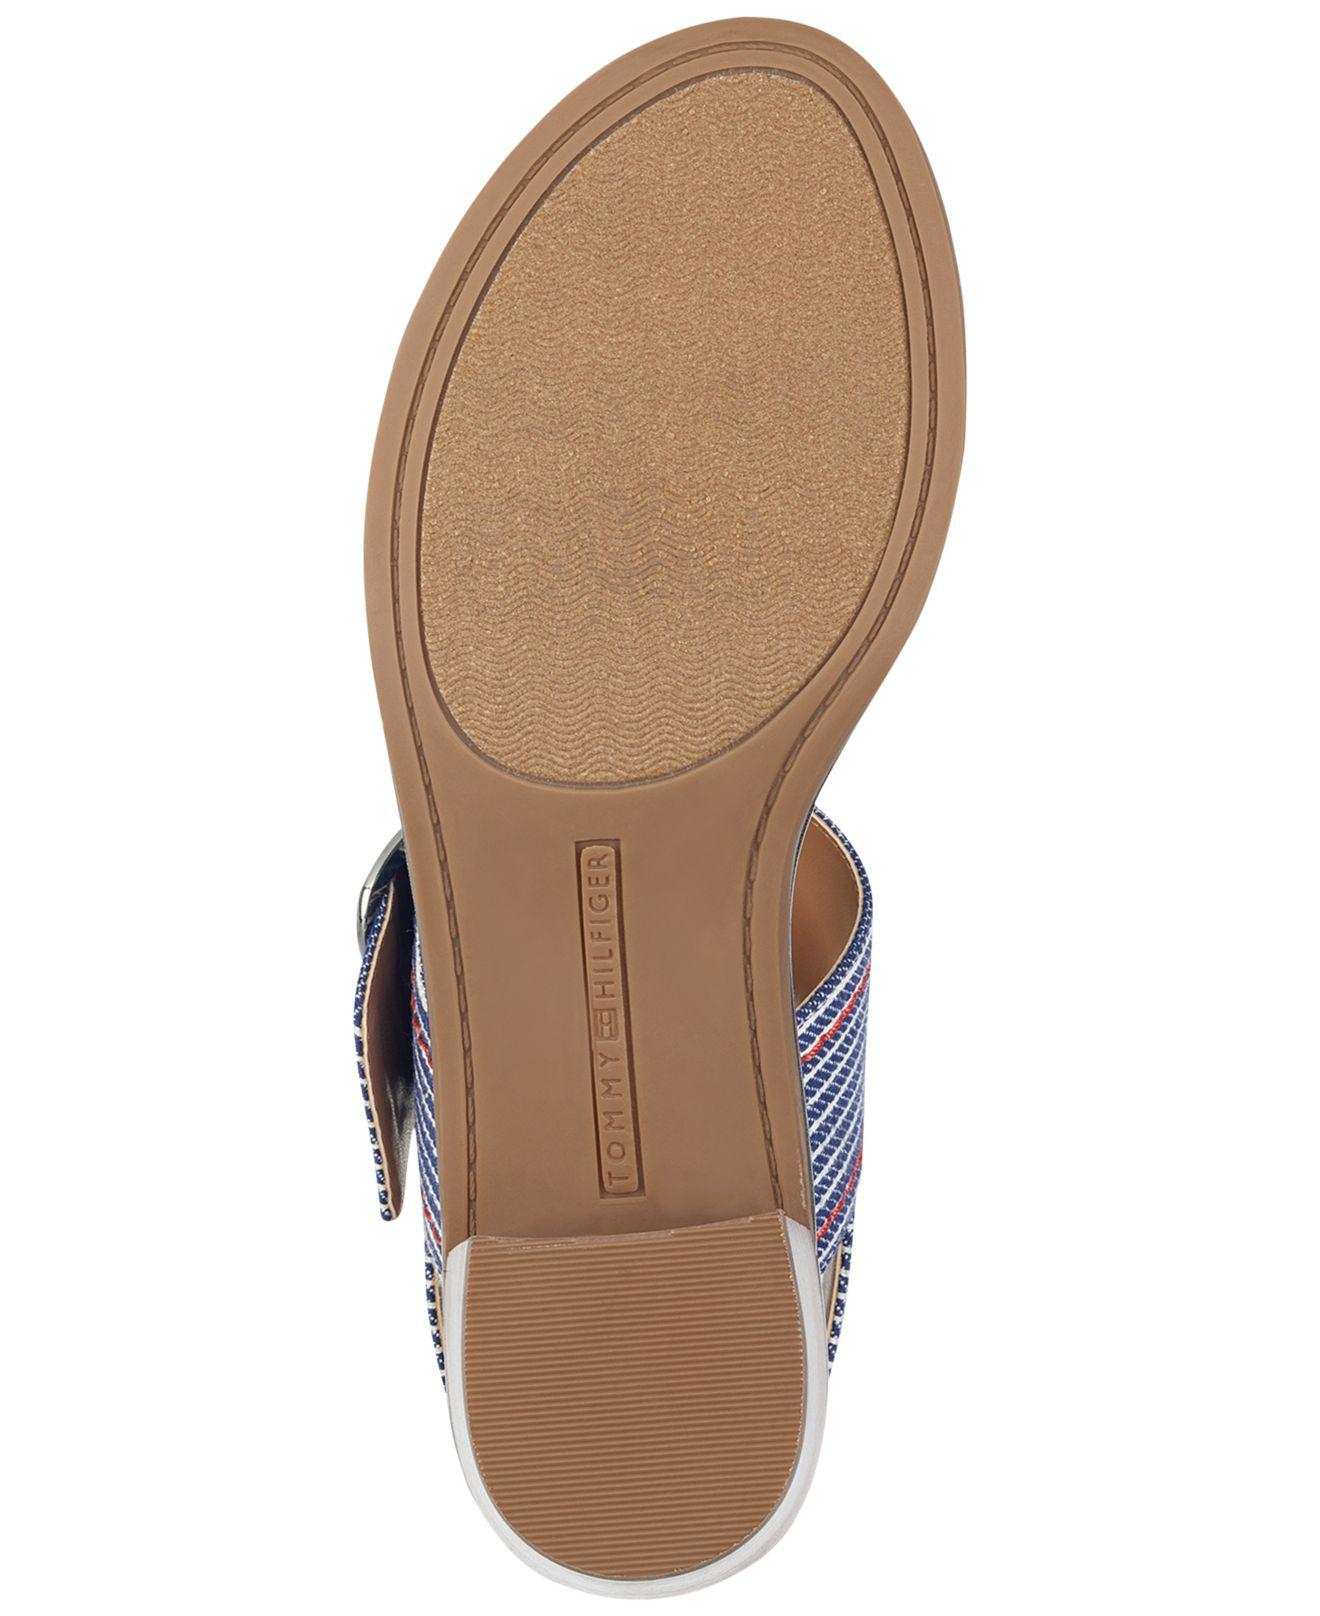 1f8b5f2ffac Lyst - Tommy Hilfiger Katz Heeled Sandal in Blue